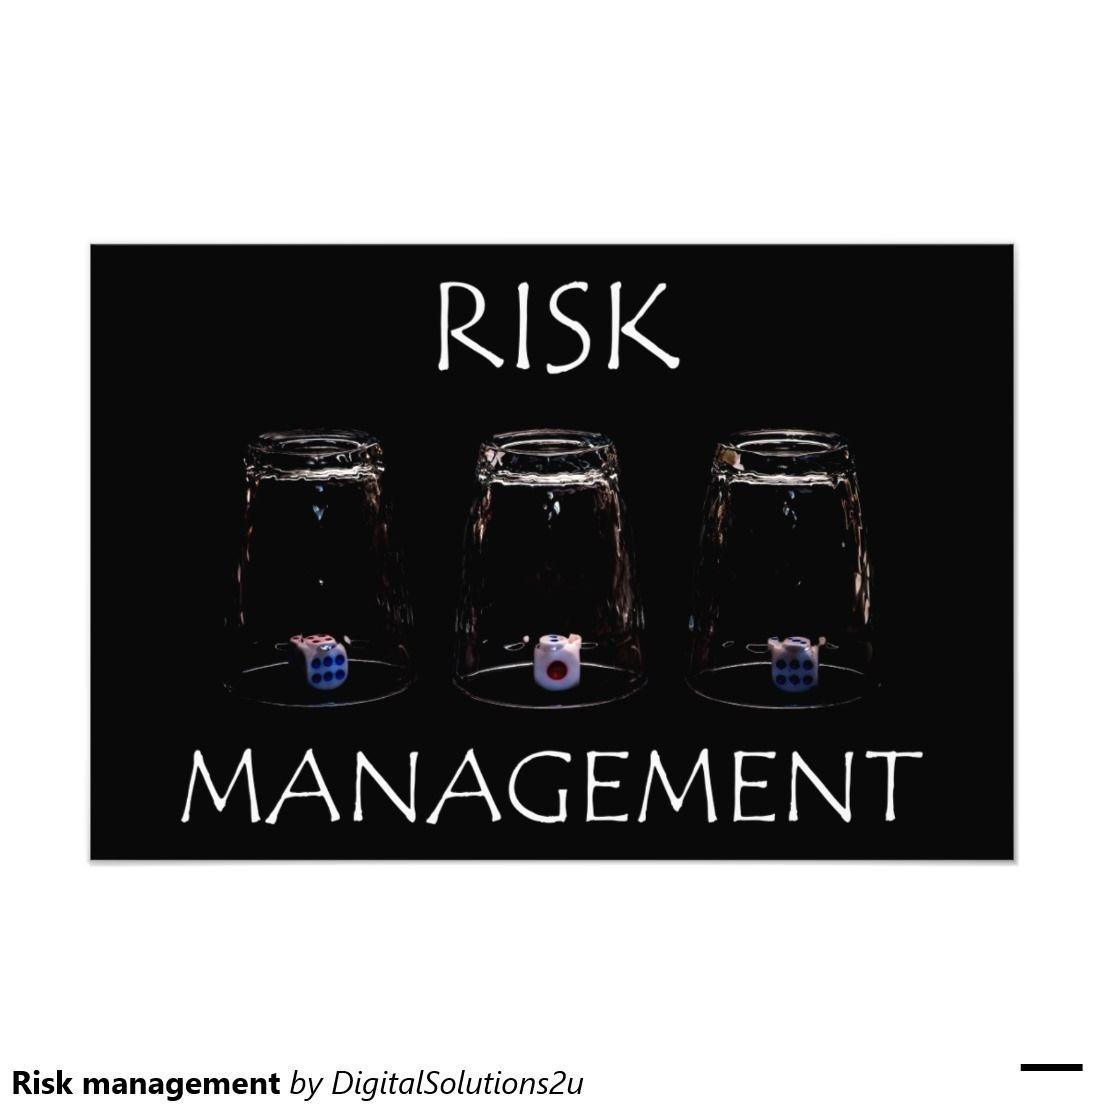 Risk management photo print